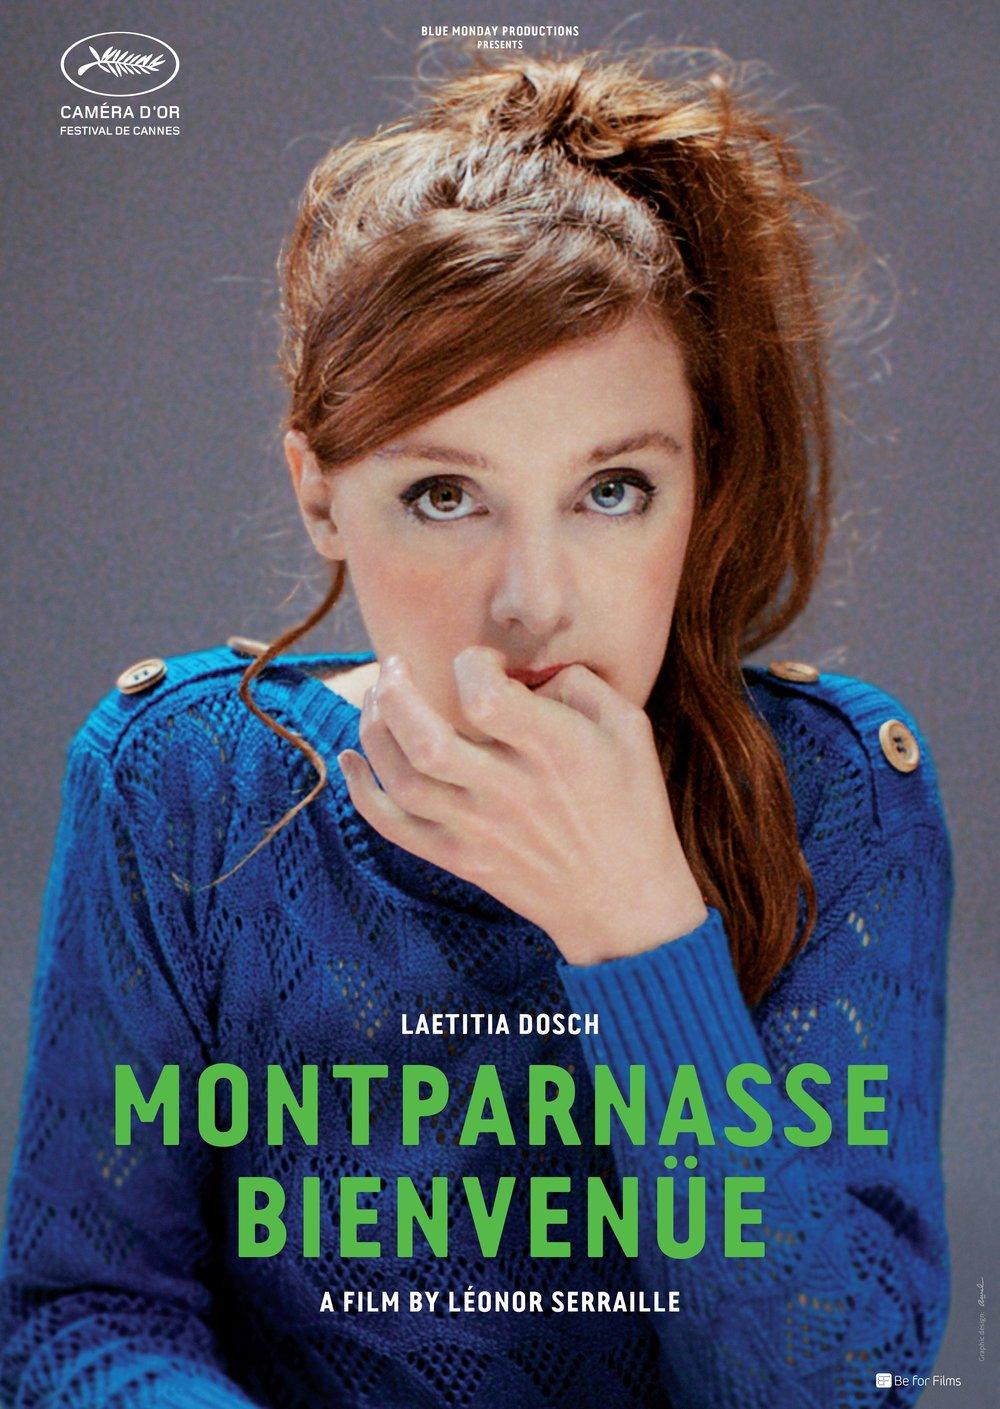 MONTPARNASSE_BIENVENUE_CAMERA_OR_93X66_BD_Affiche VI.jpg